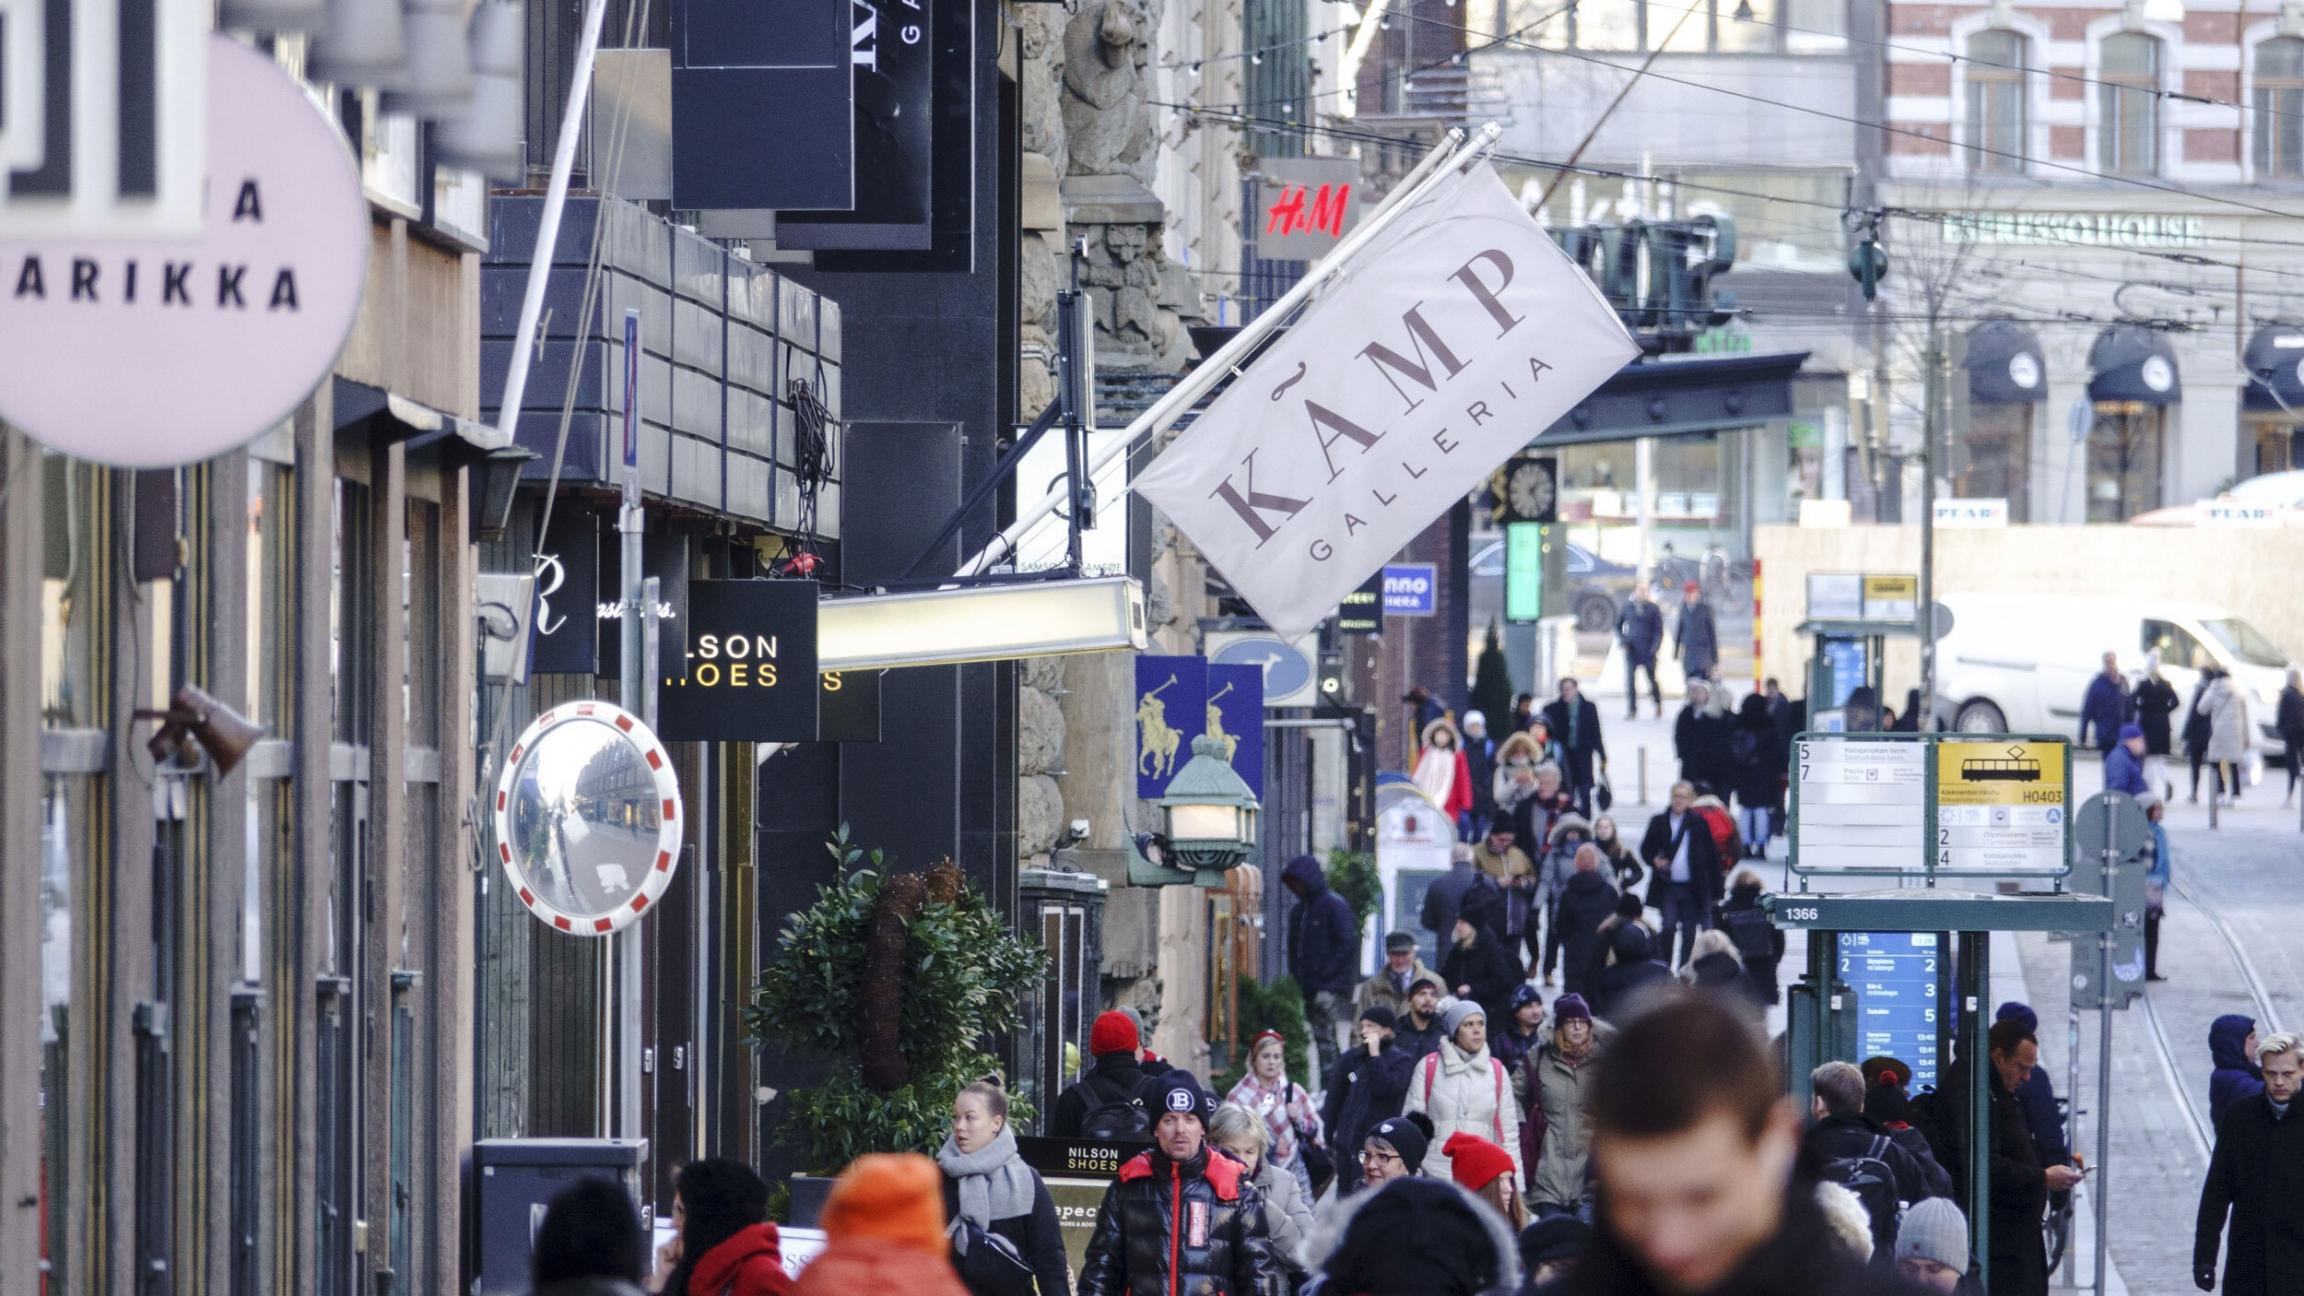 Pedestrians walk along Aleksanterinkatu, the main shopping street, in Helsinki, Finland.